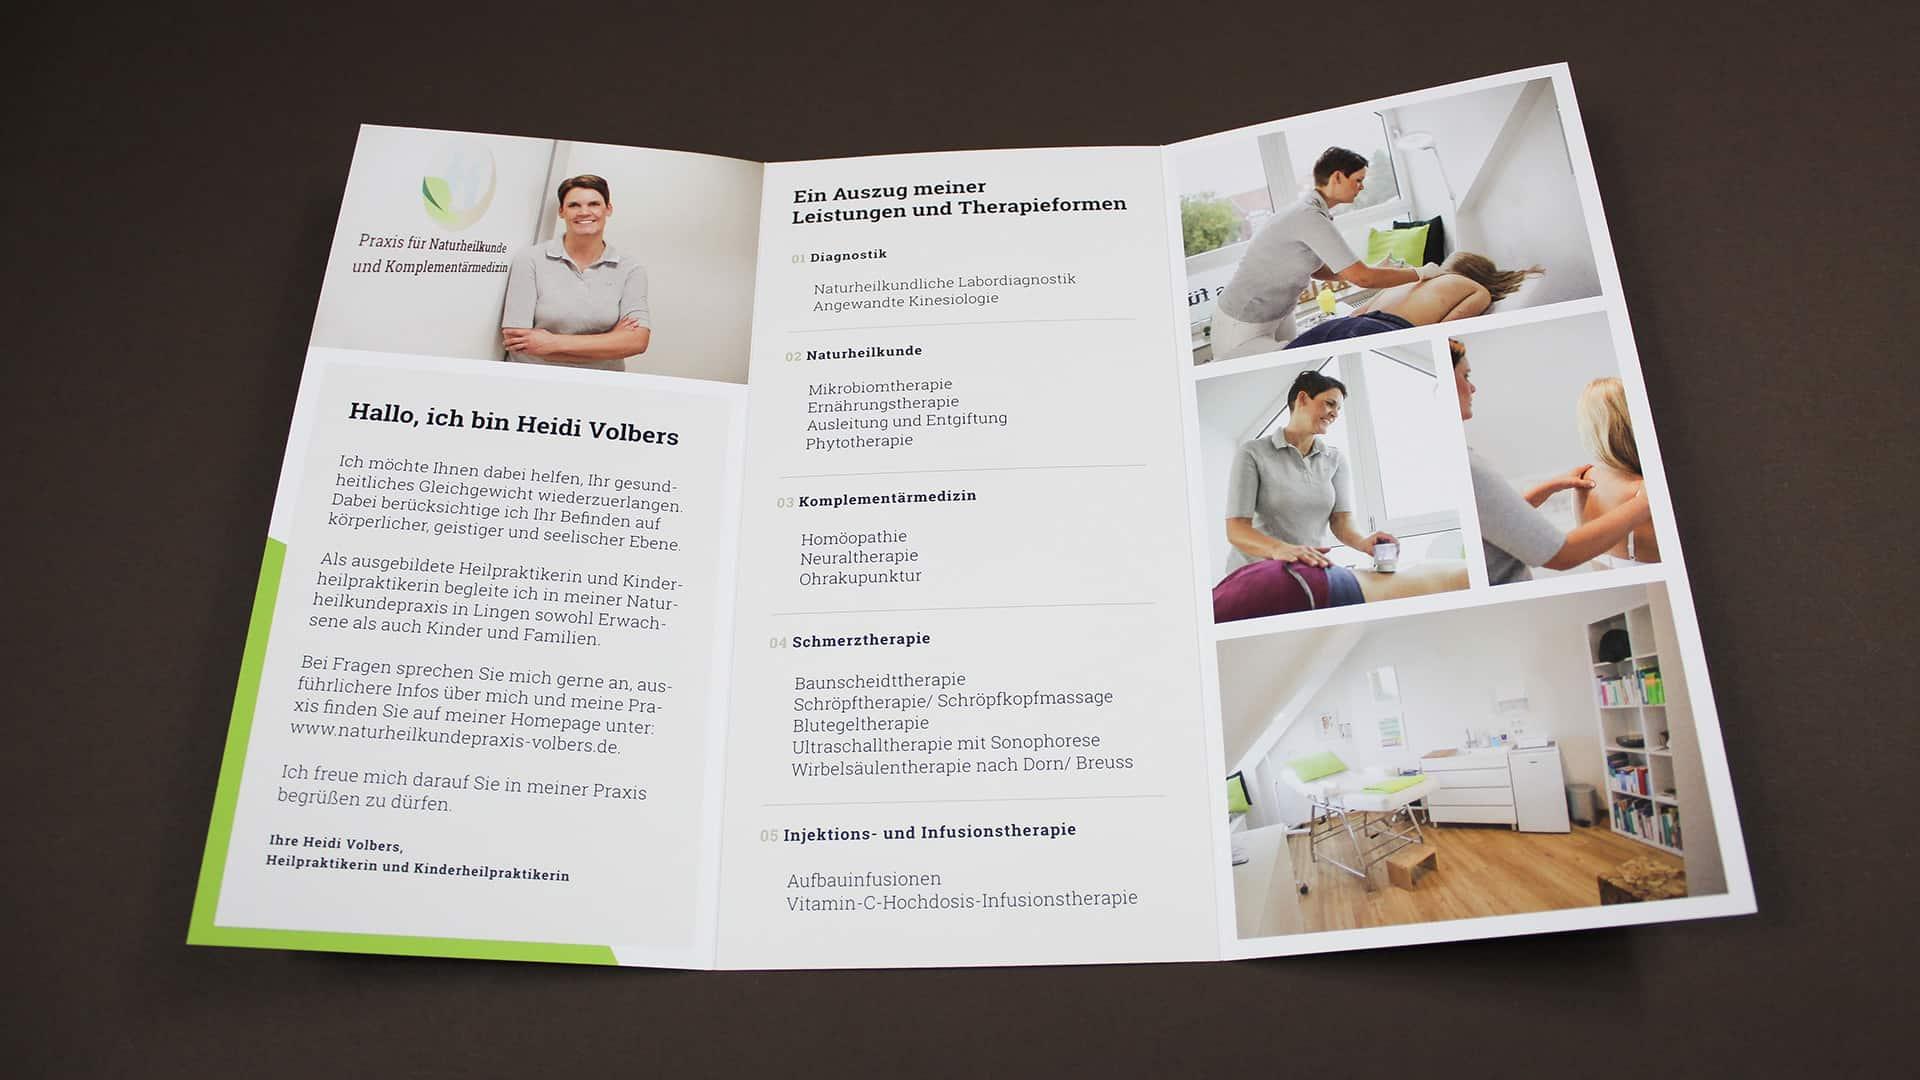 webdesign-corporate-design-geniacs-werbeagentur-muenster-heidi-volbers-broschuere-innen-xl